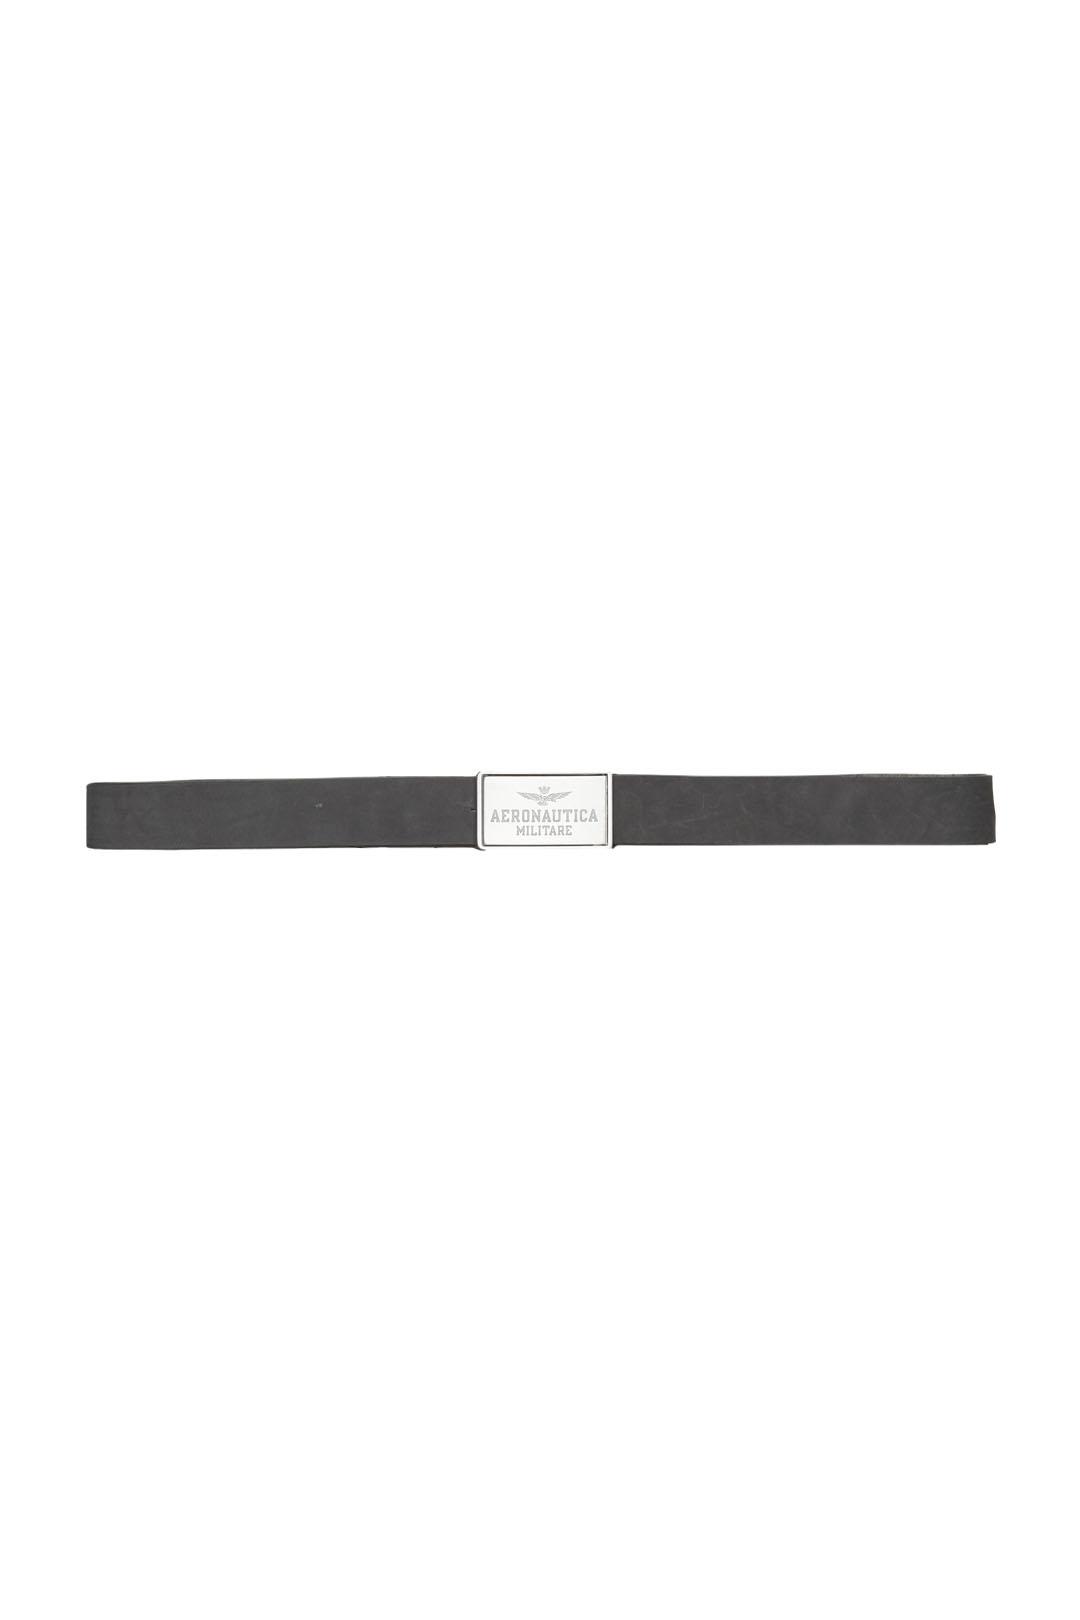 Soft leather belt                        2